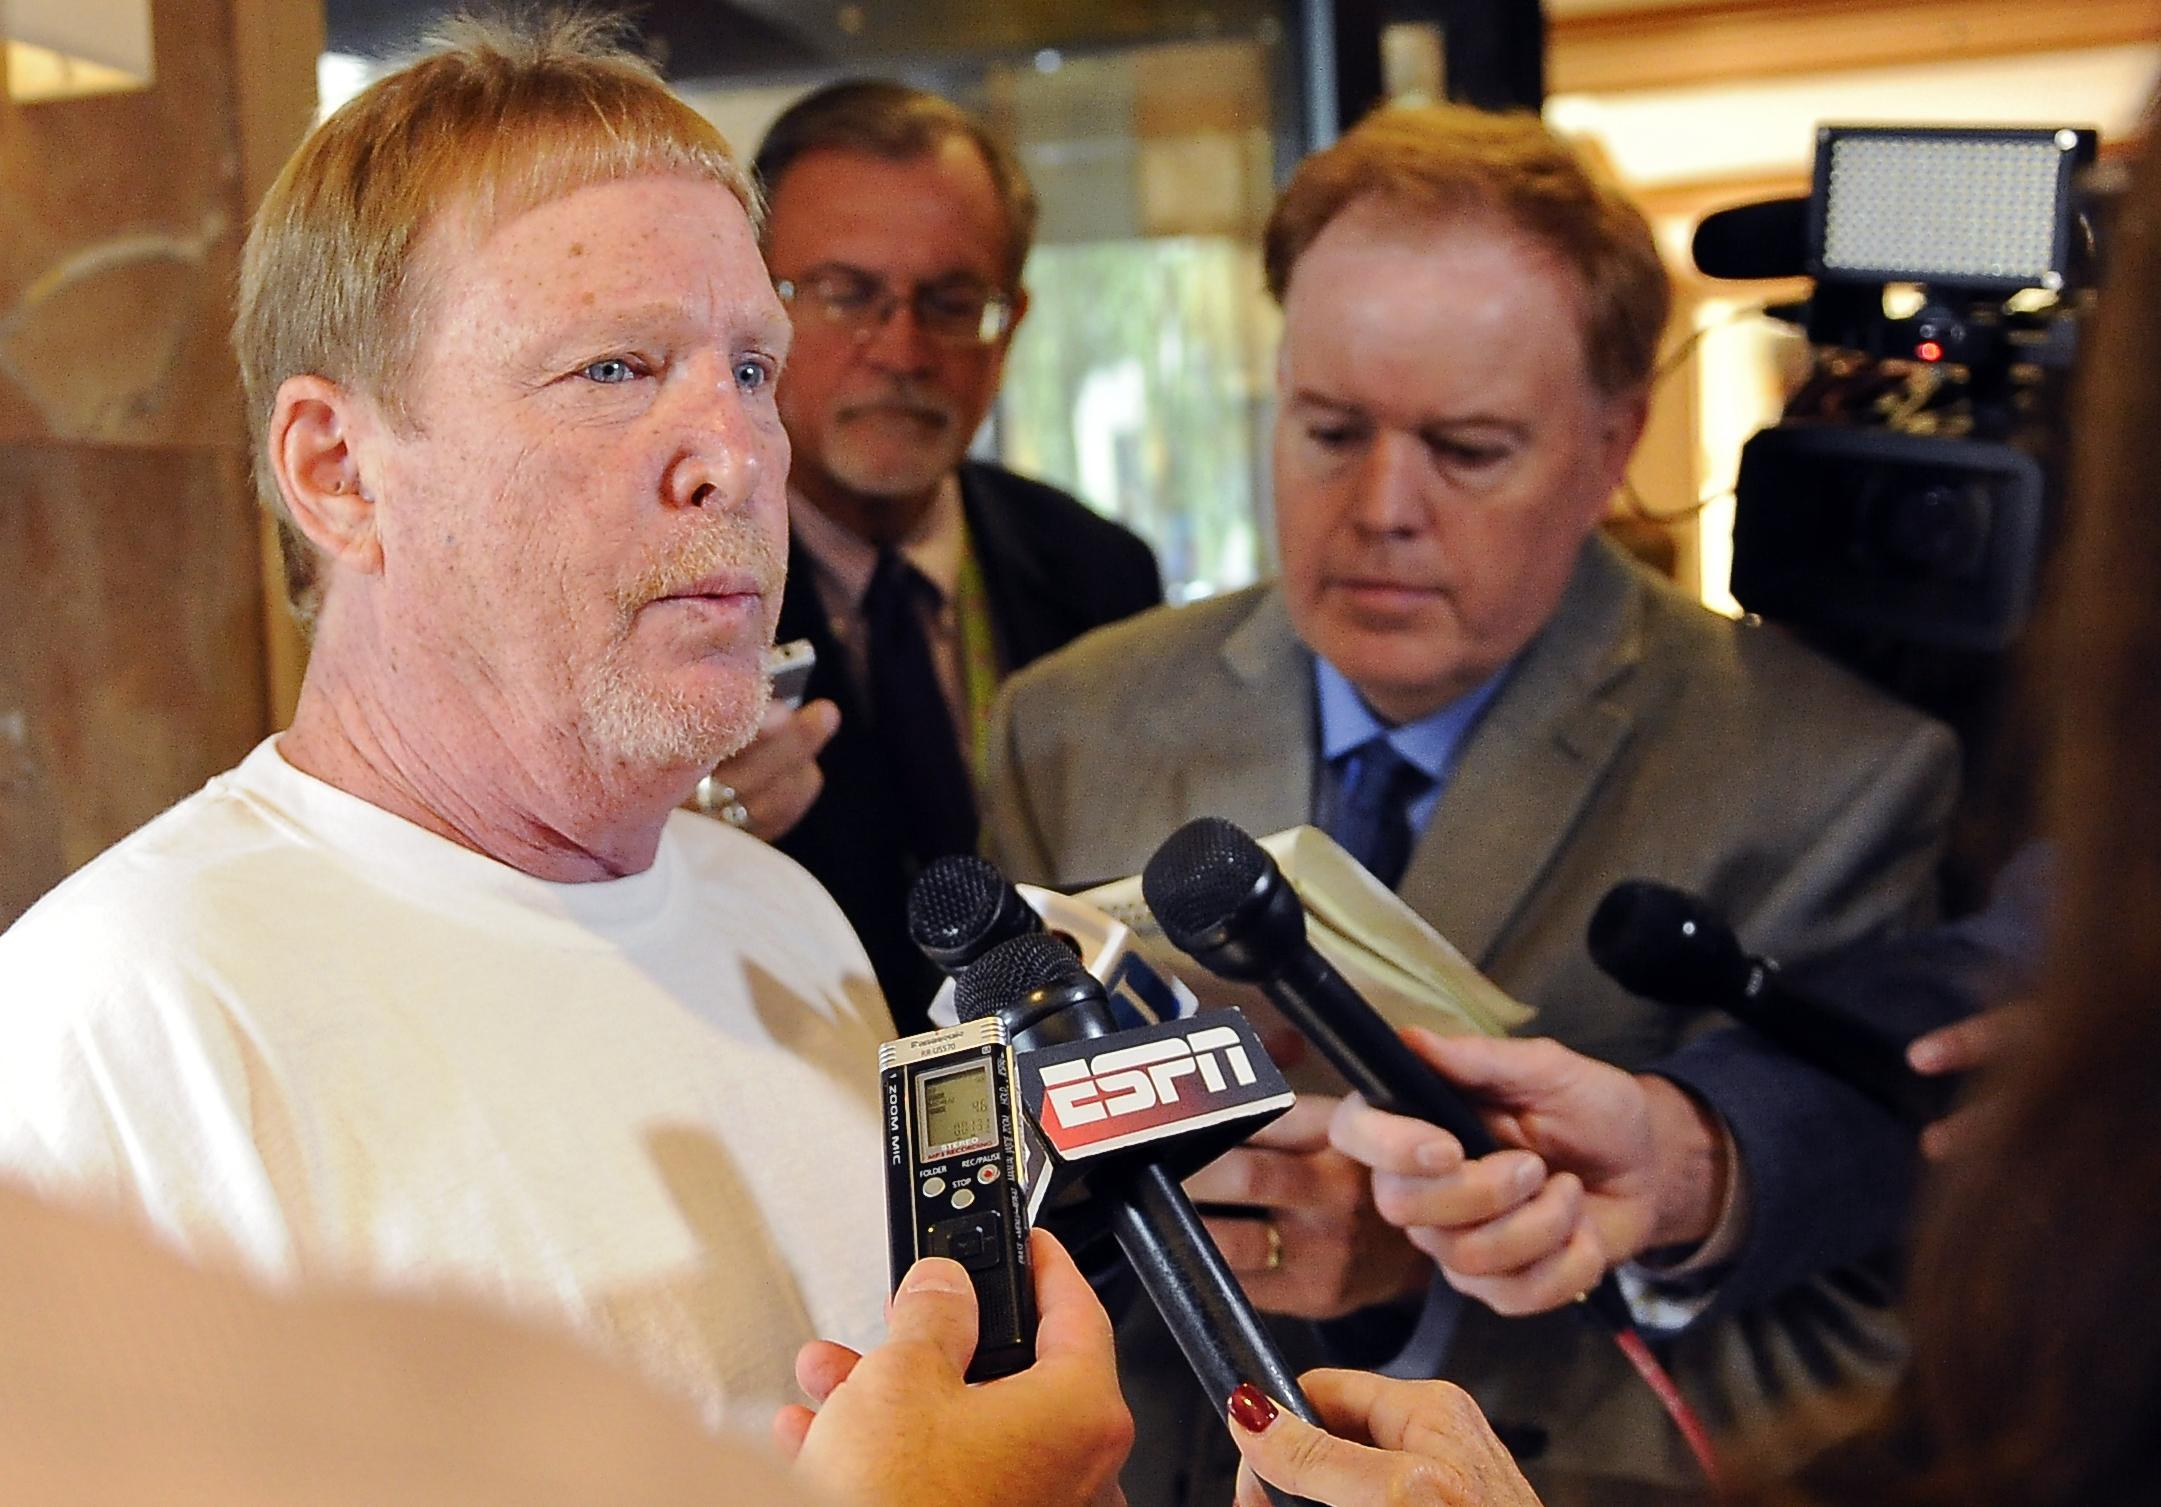 NFL Notes: Raiders owner Mark Davis makes presentation to